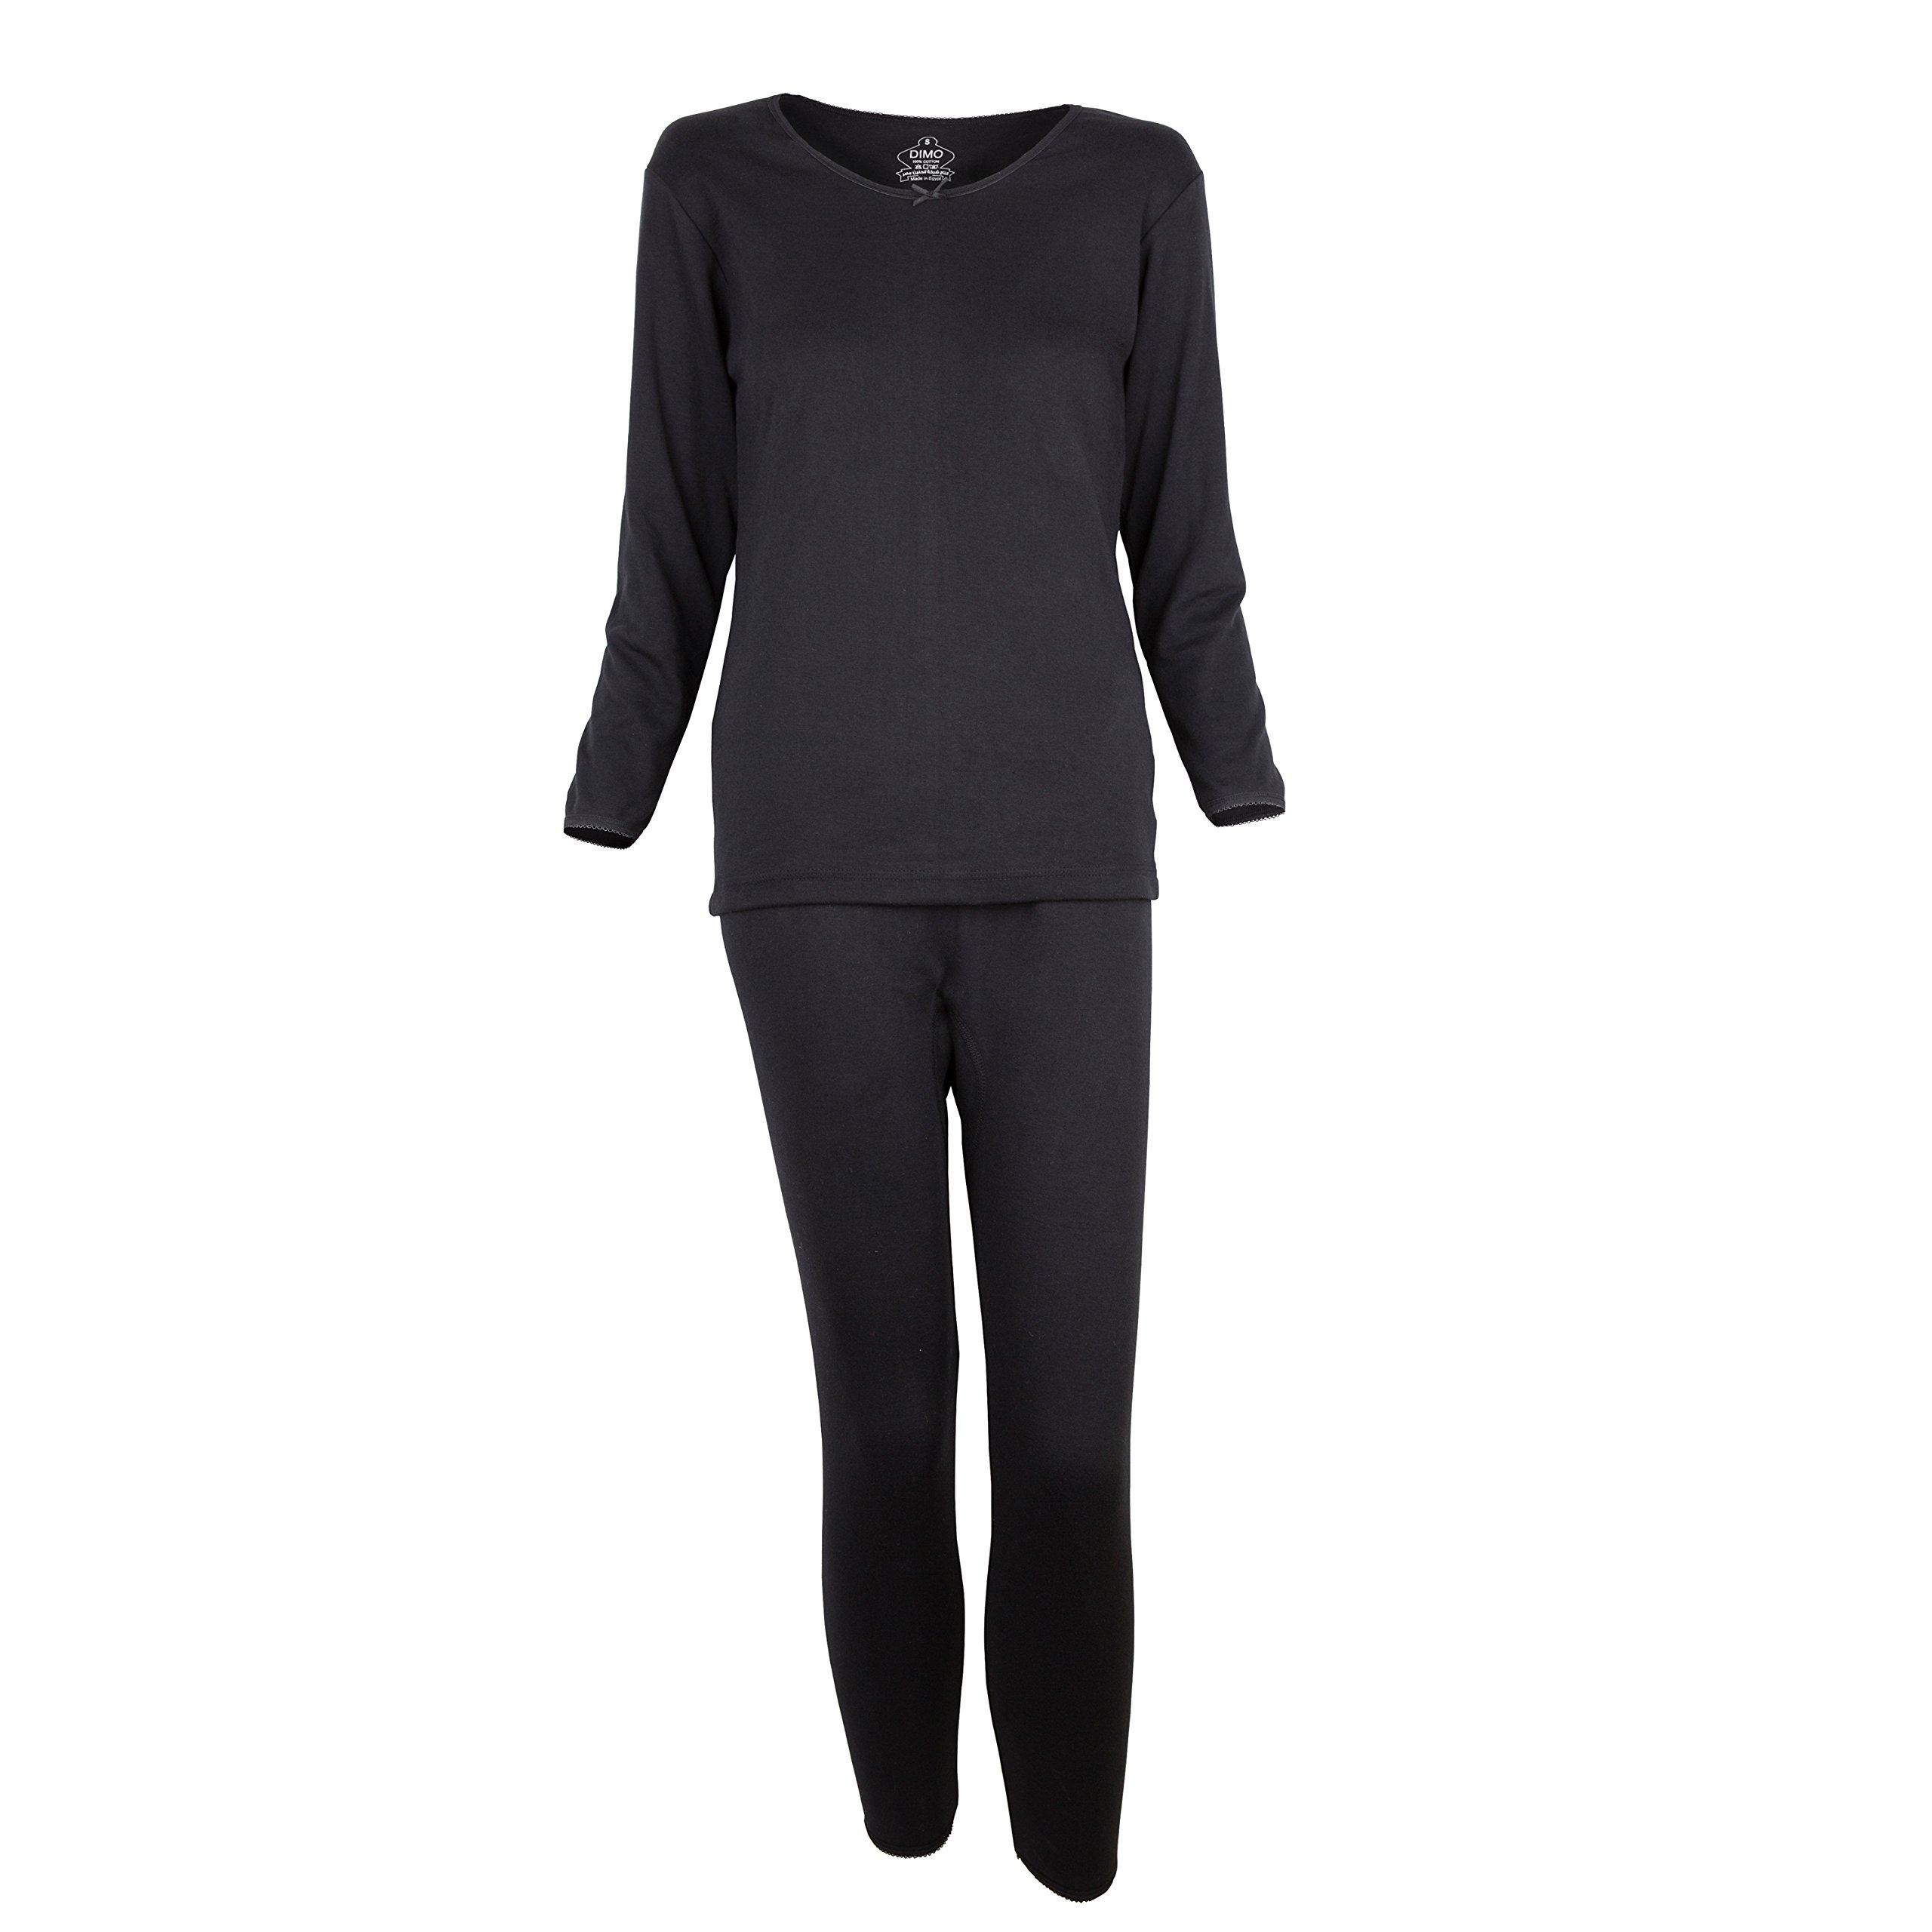 Nile Cotton Dimo Women Long Johns Thermal Set, Fit As Pajama (X Large)